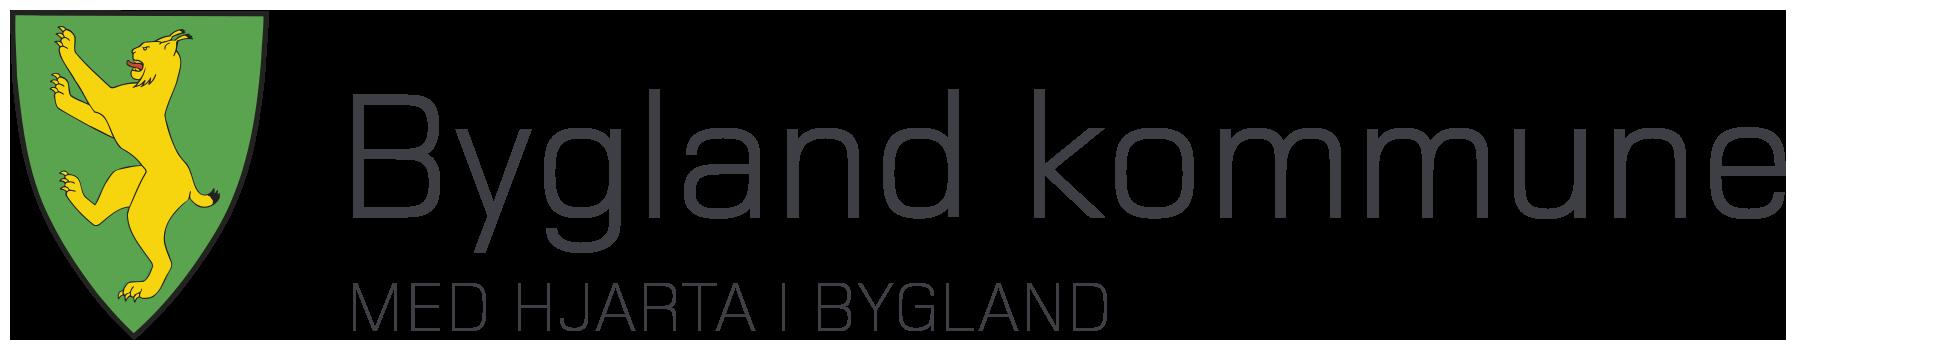 Bygland kommune sitt kommunevåpen